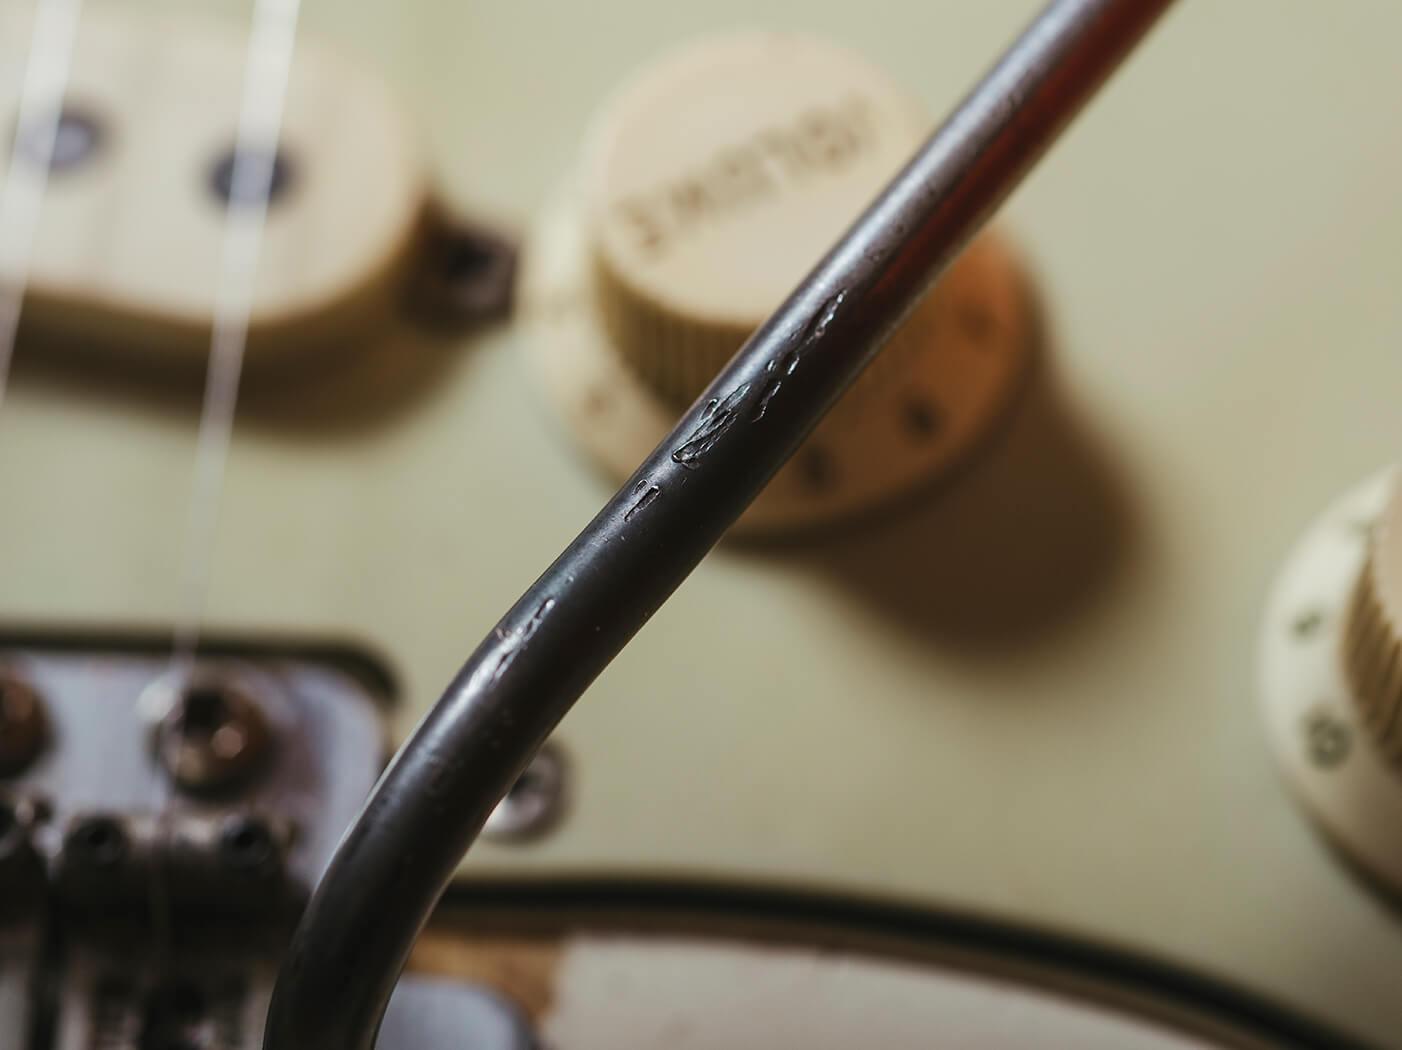 Fender Jimi Hendrix 63 tremolo detail